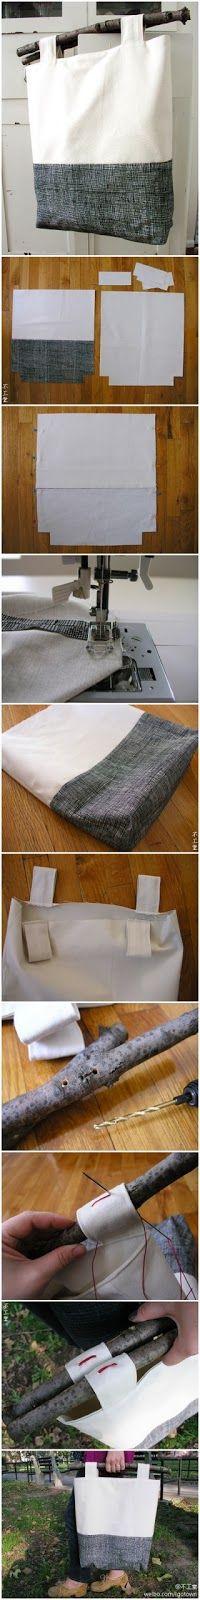 Easy DIY Crafts: Cute DIY Bag